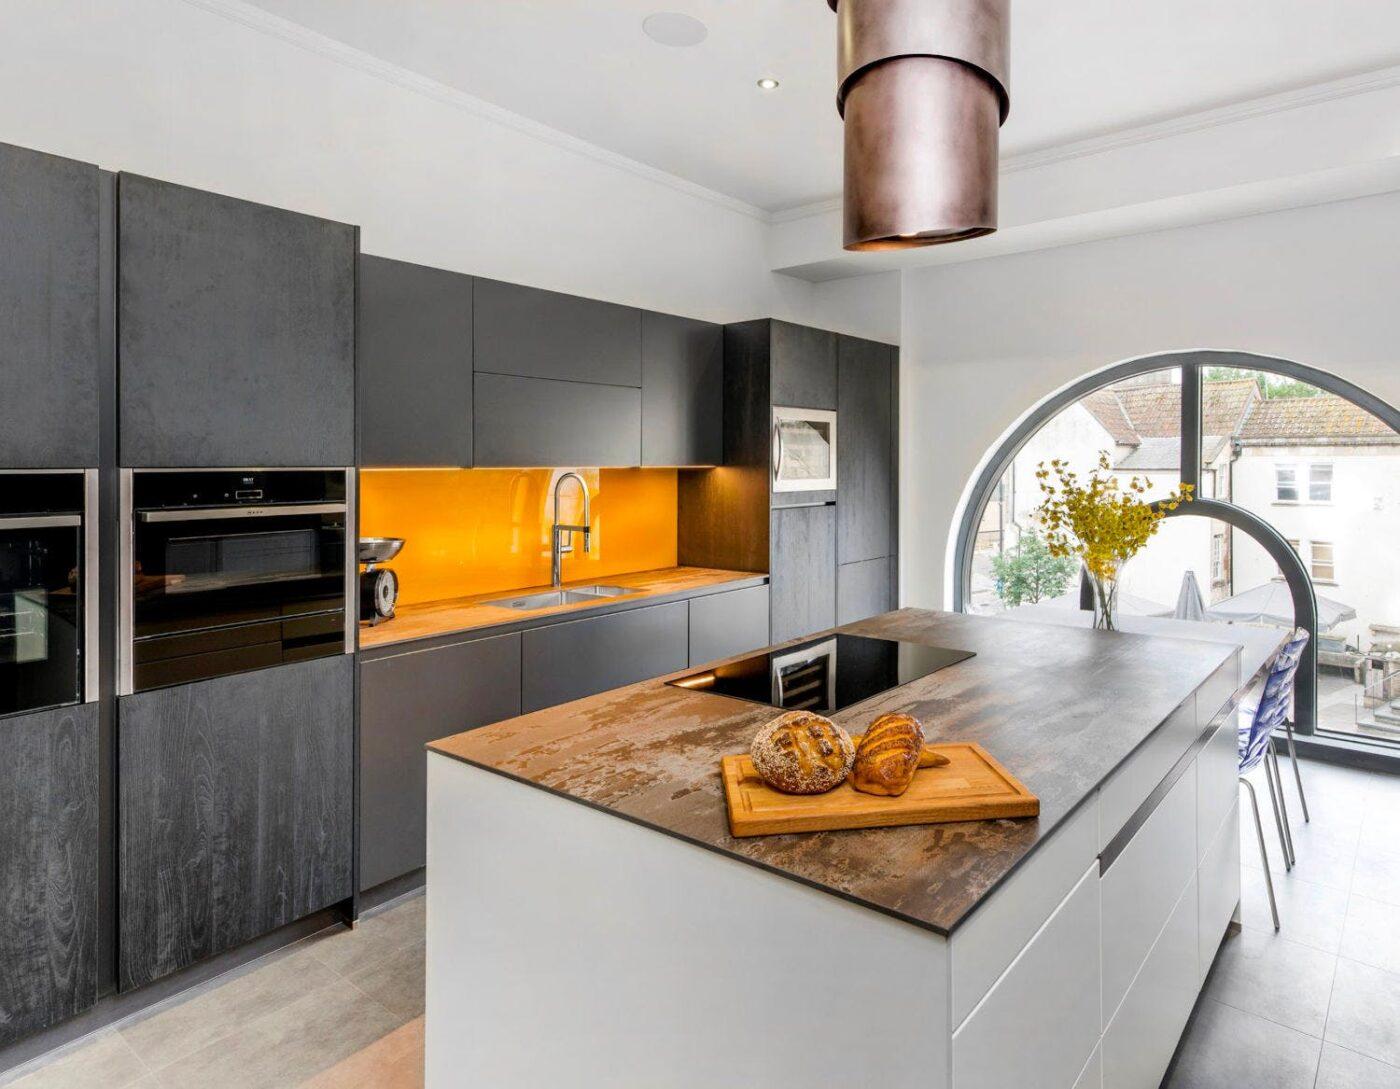 Cucine modulari: pratiche e versatili